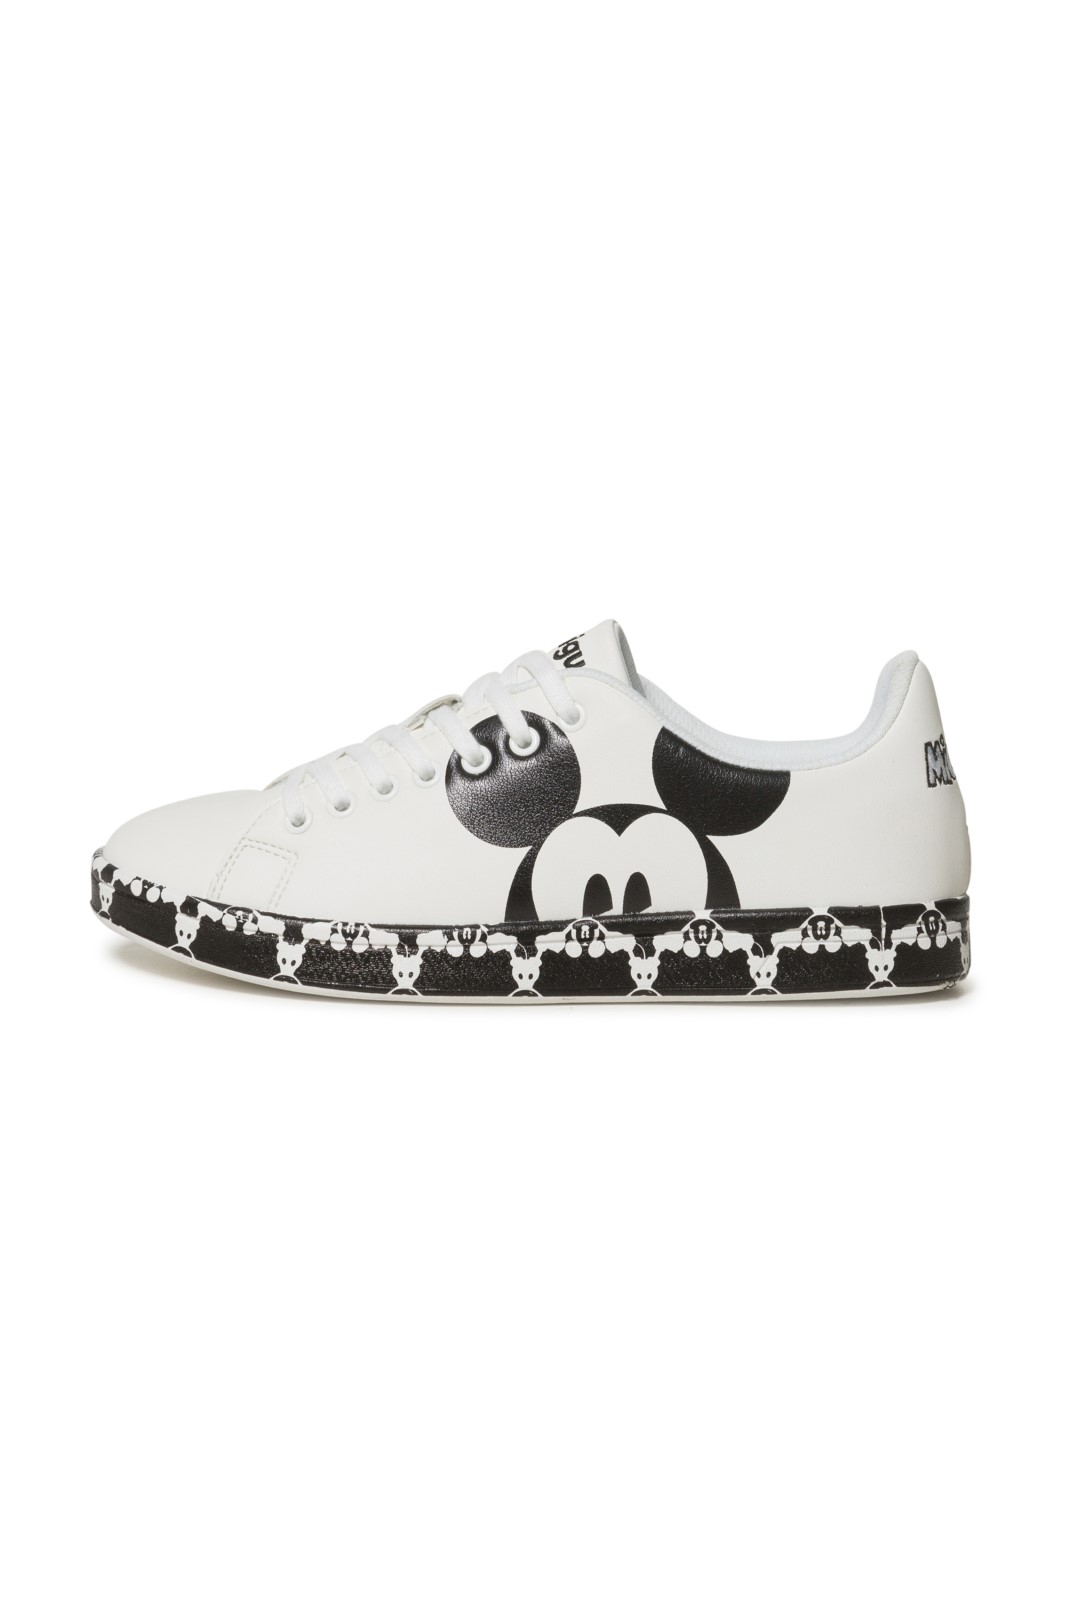 ... Desigual černo-bílé tenisky Shoes Cosmic Mickey - 36. -5% Nové ... b1e5b7ffab